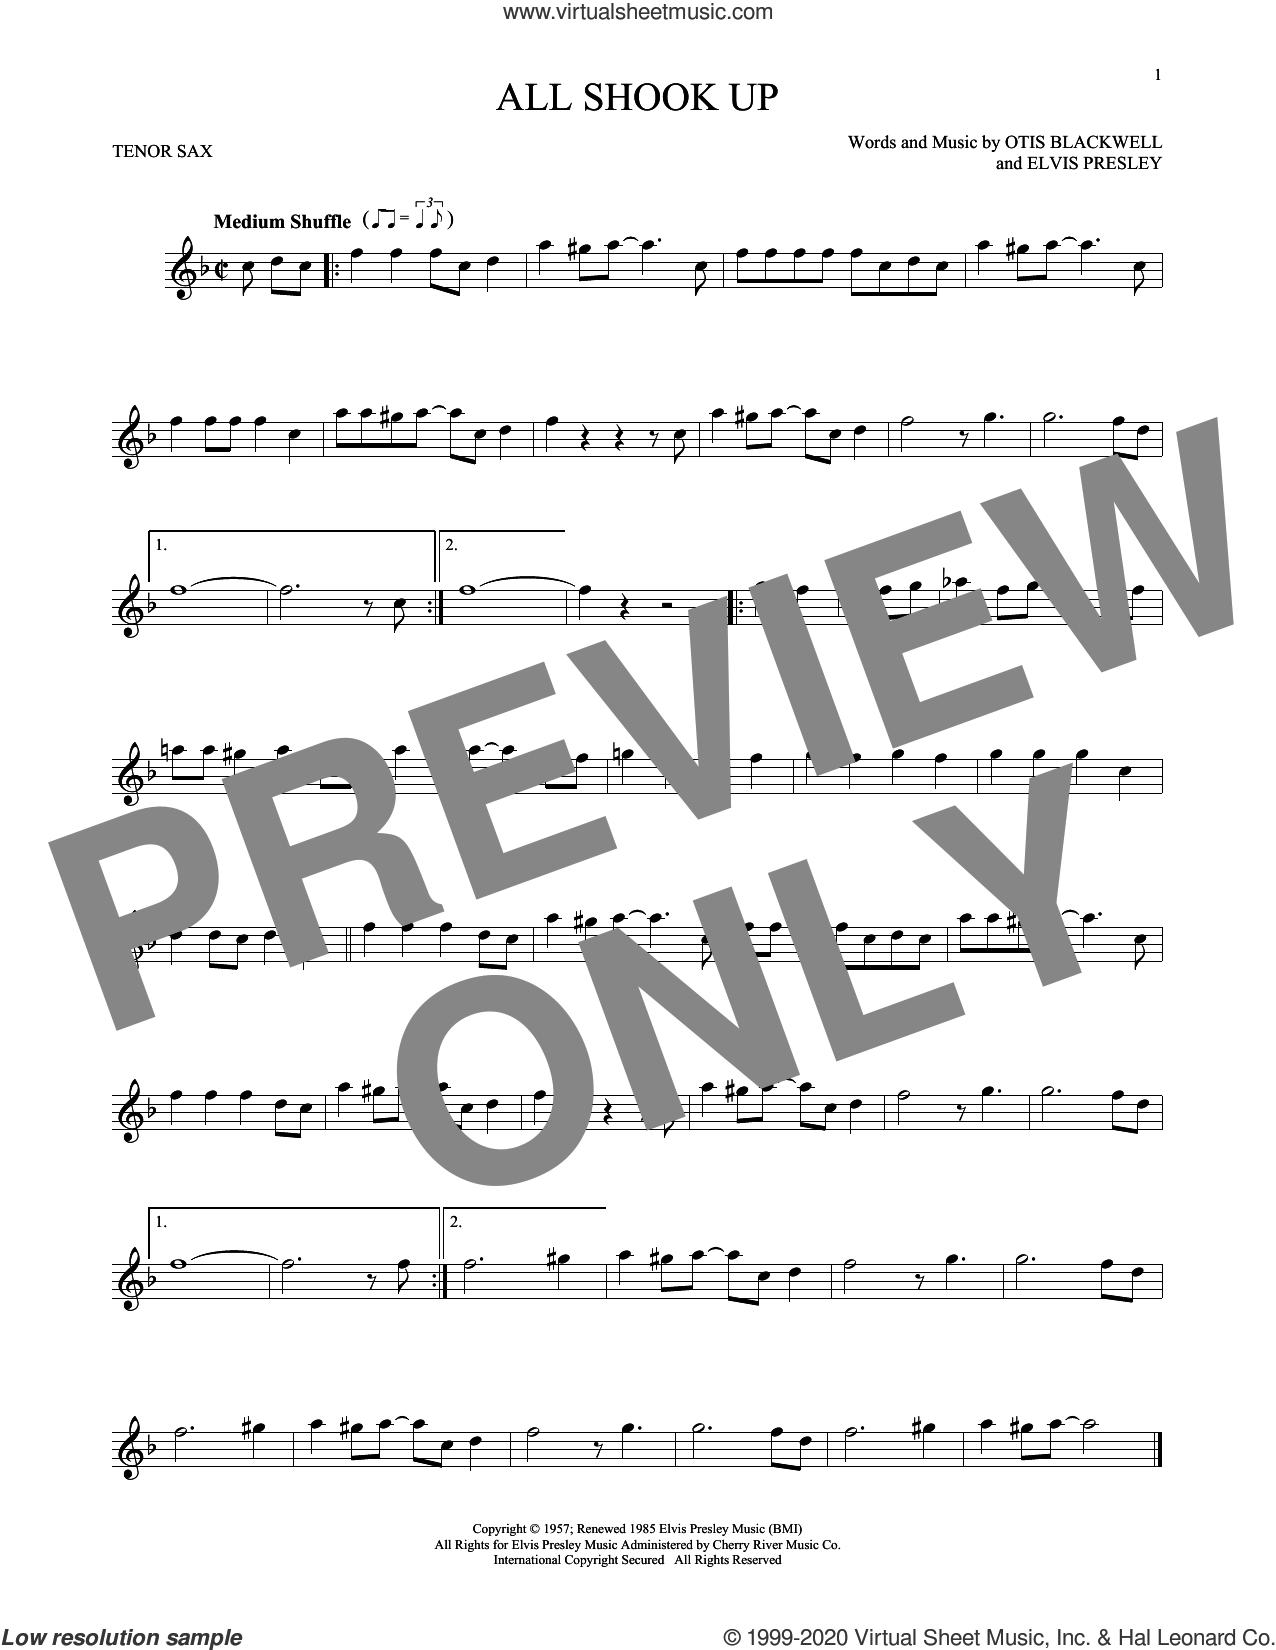 All Shook Up sheet music for tenor saxophone solo by Elvis Presley, Suzi Quatro and Otis Blackwell, intermediate skill level